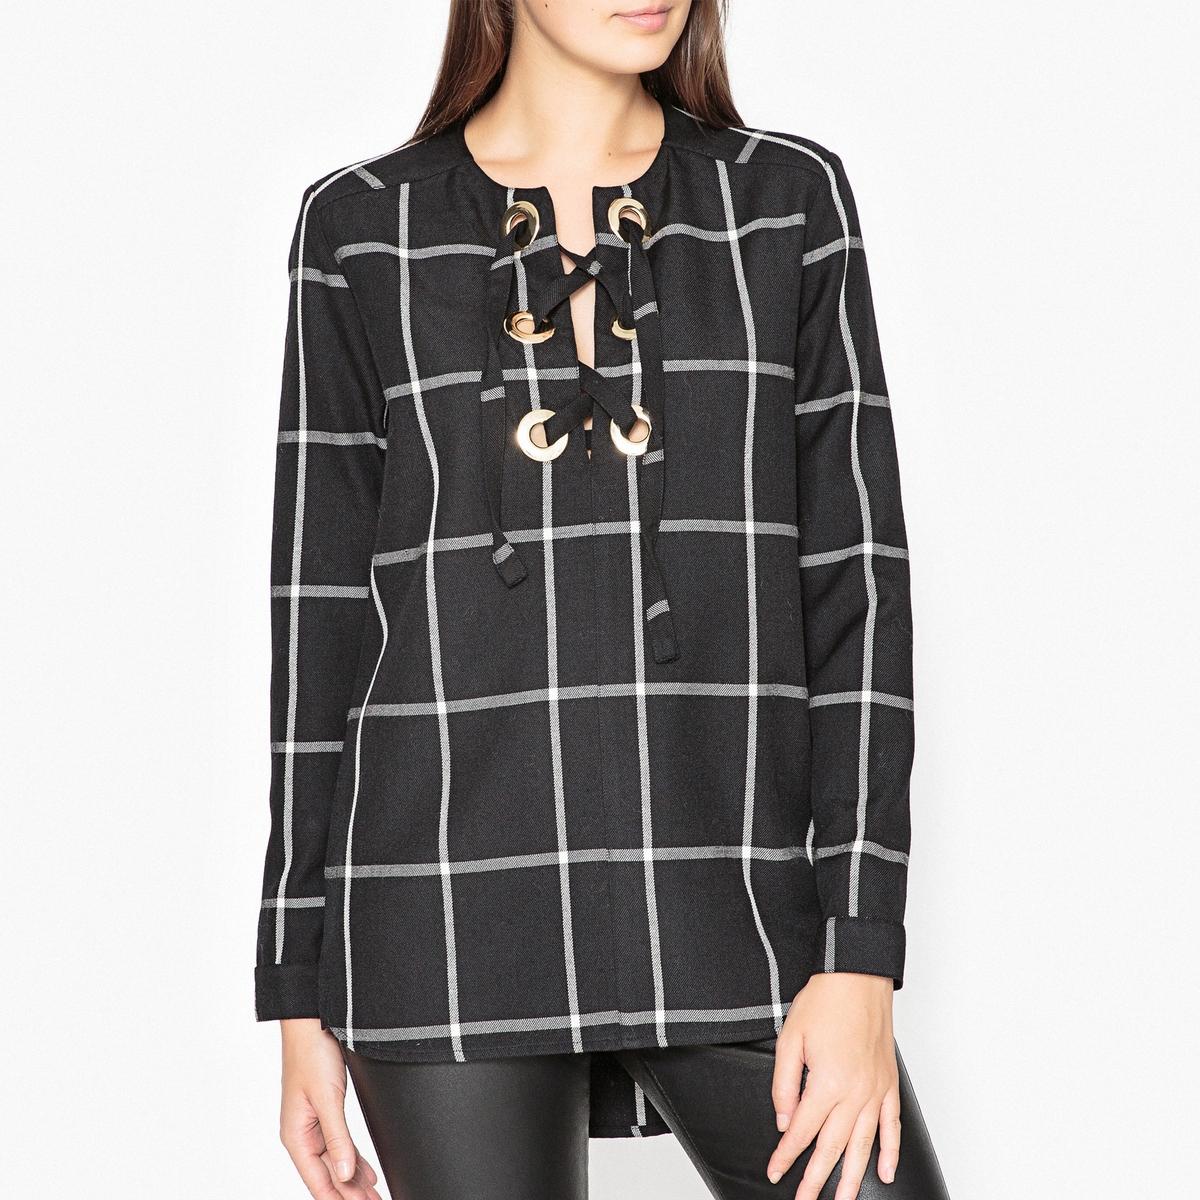 Блузка из 100% шерсти TAPE